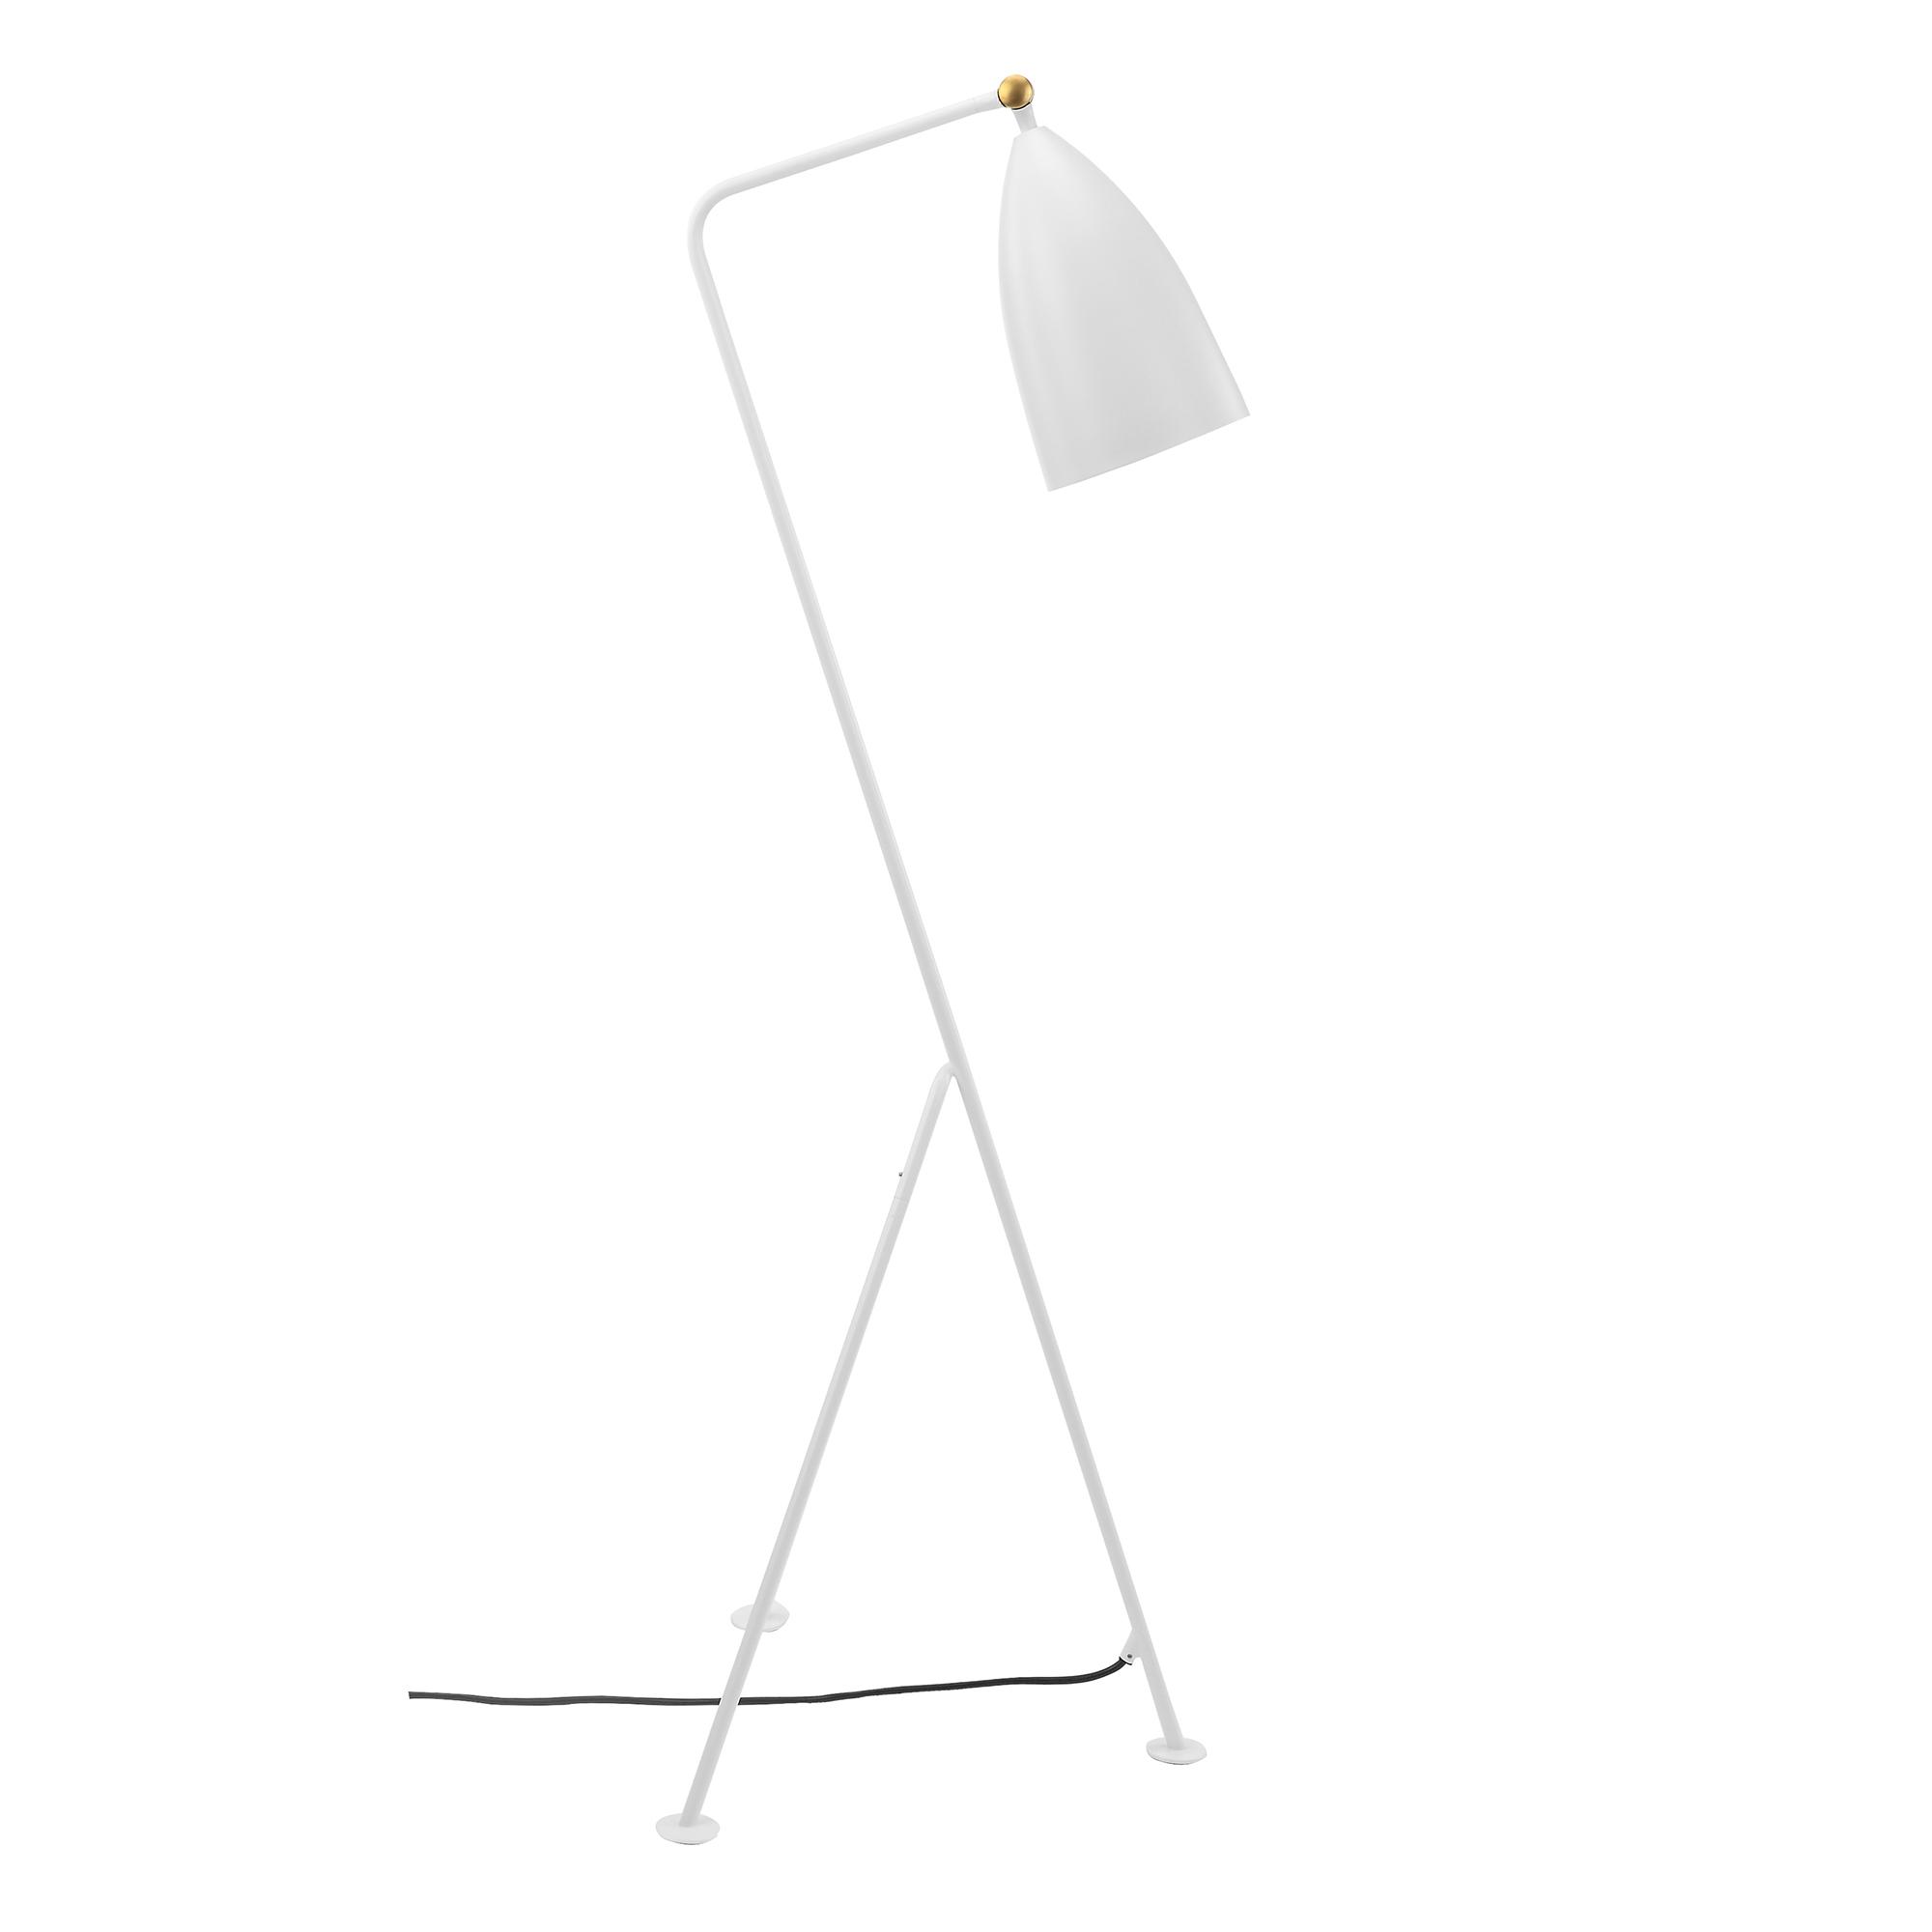 Details About New Greta Grossman Replica Grashoppa Floor Lamp Milano Luci Lamps